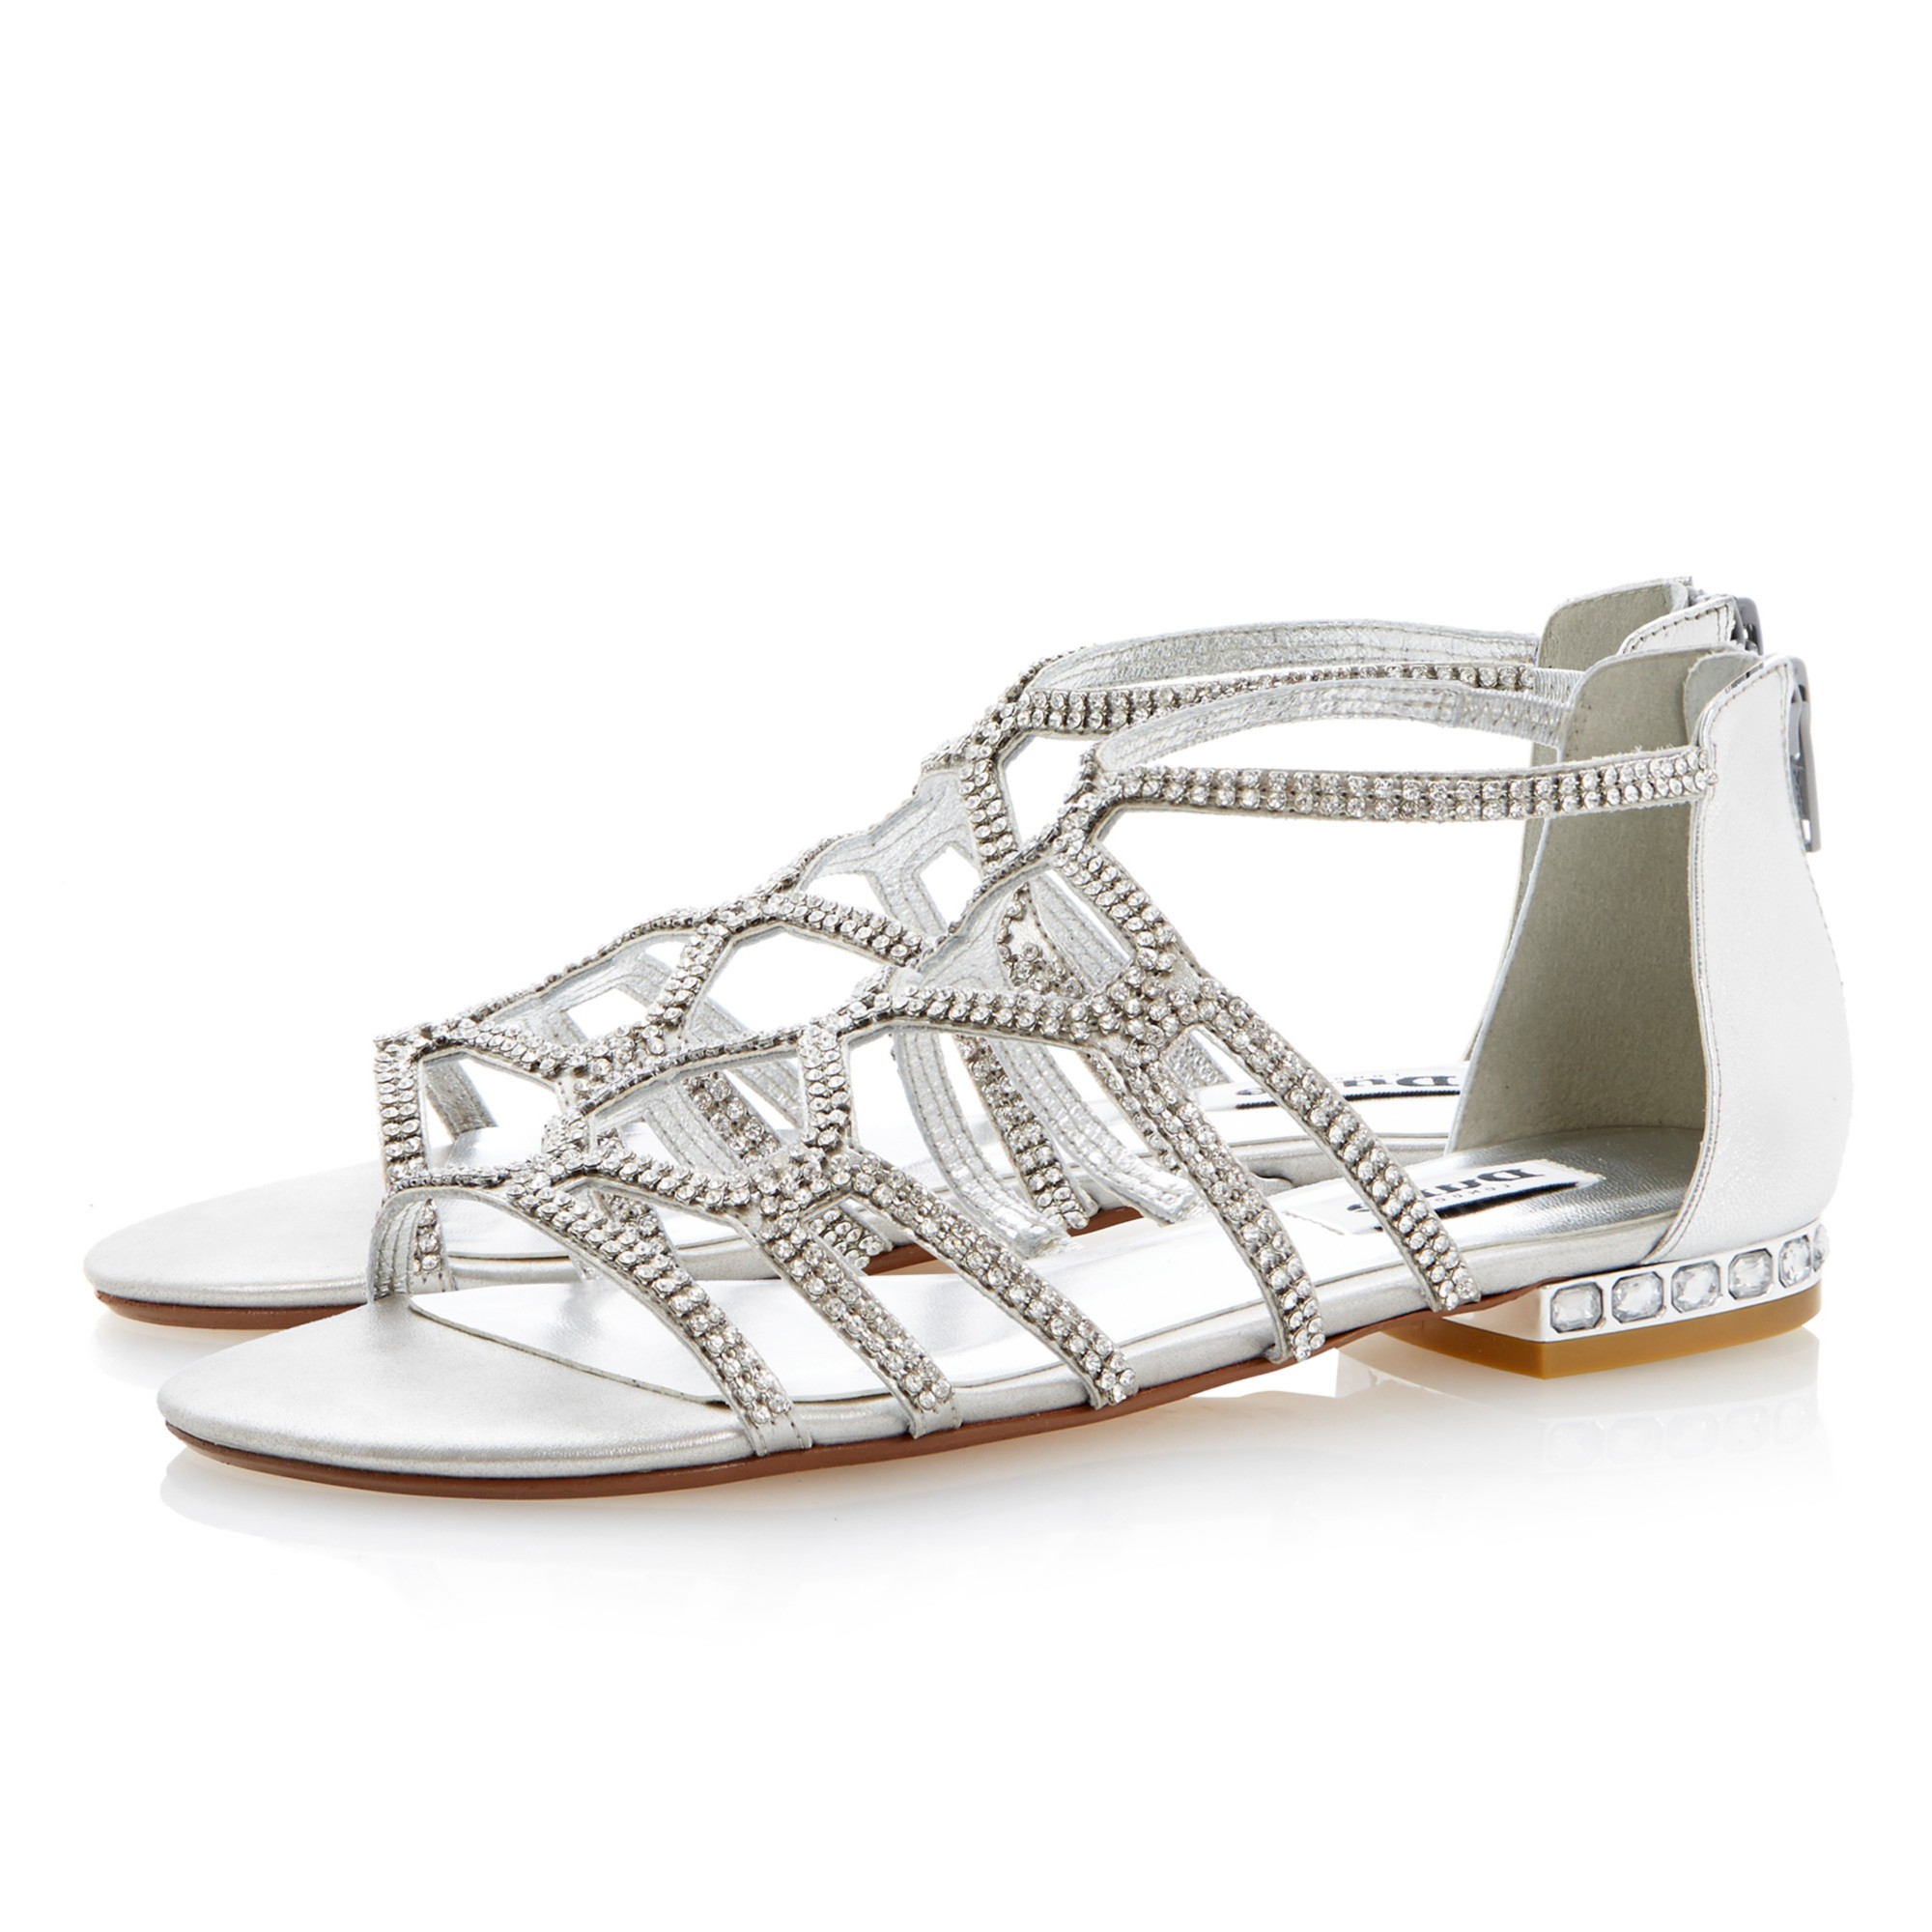 4817827c8 Dune Kym Caged Diamante Flat Sandals in Metallic - Lyst